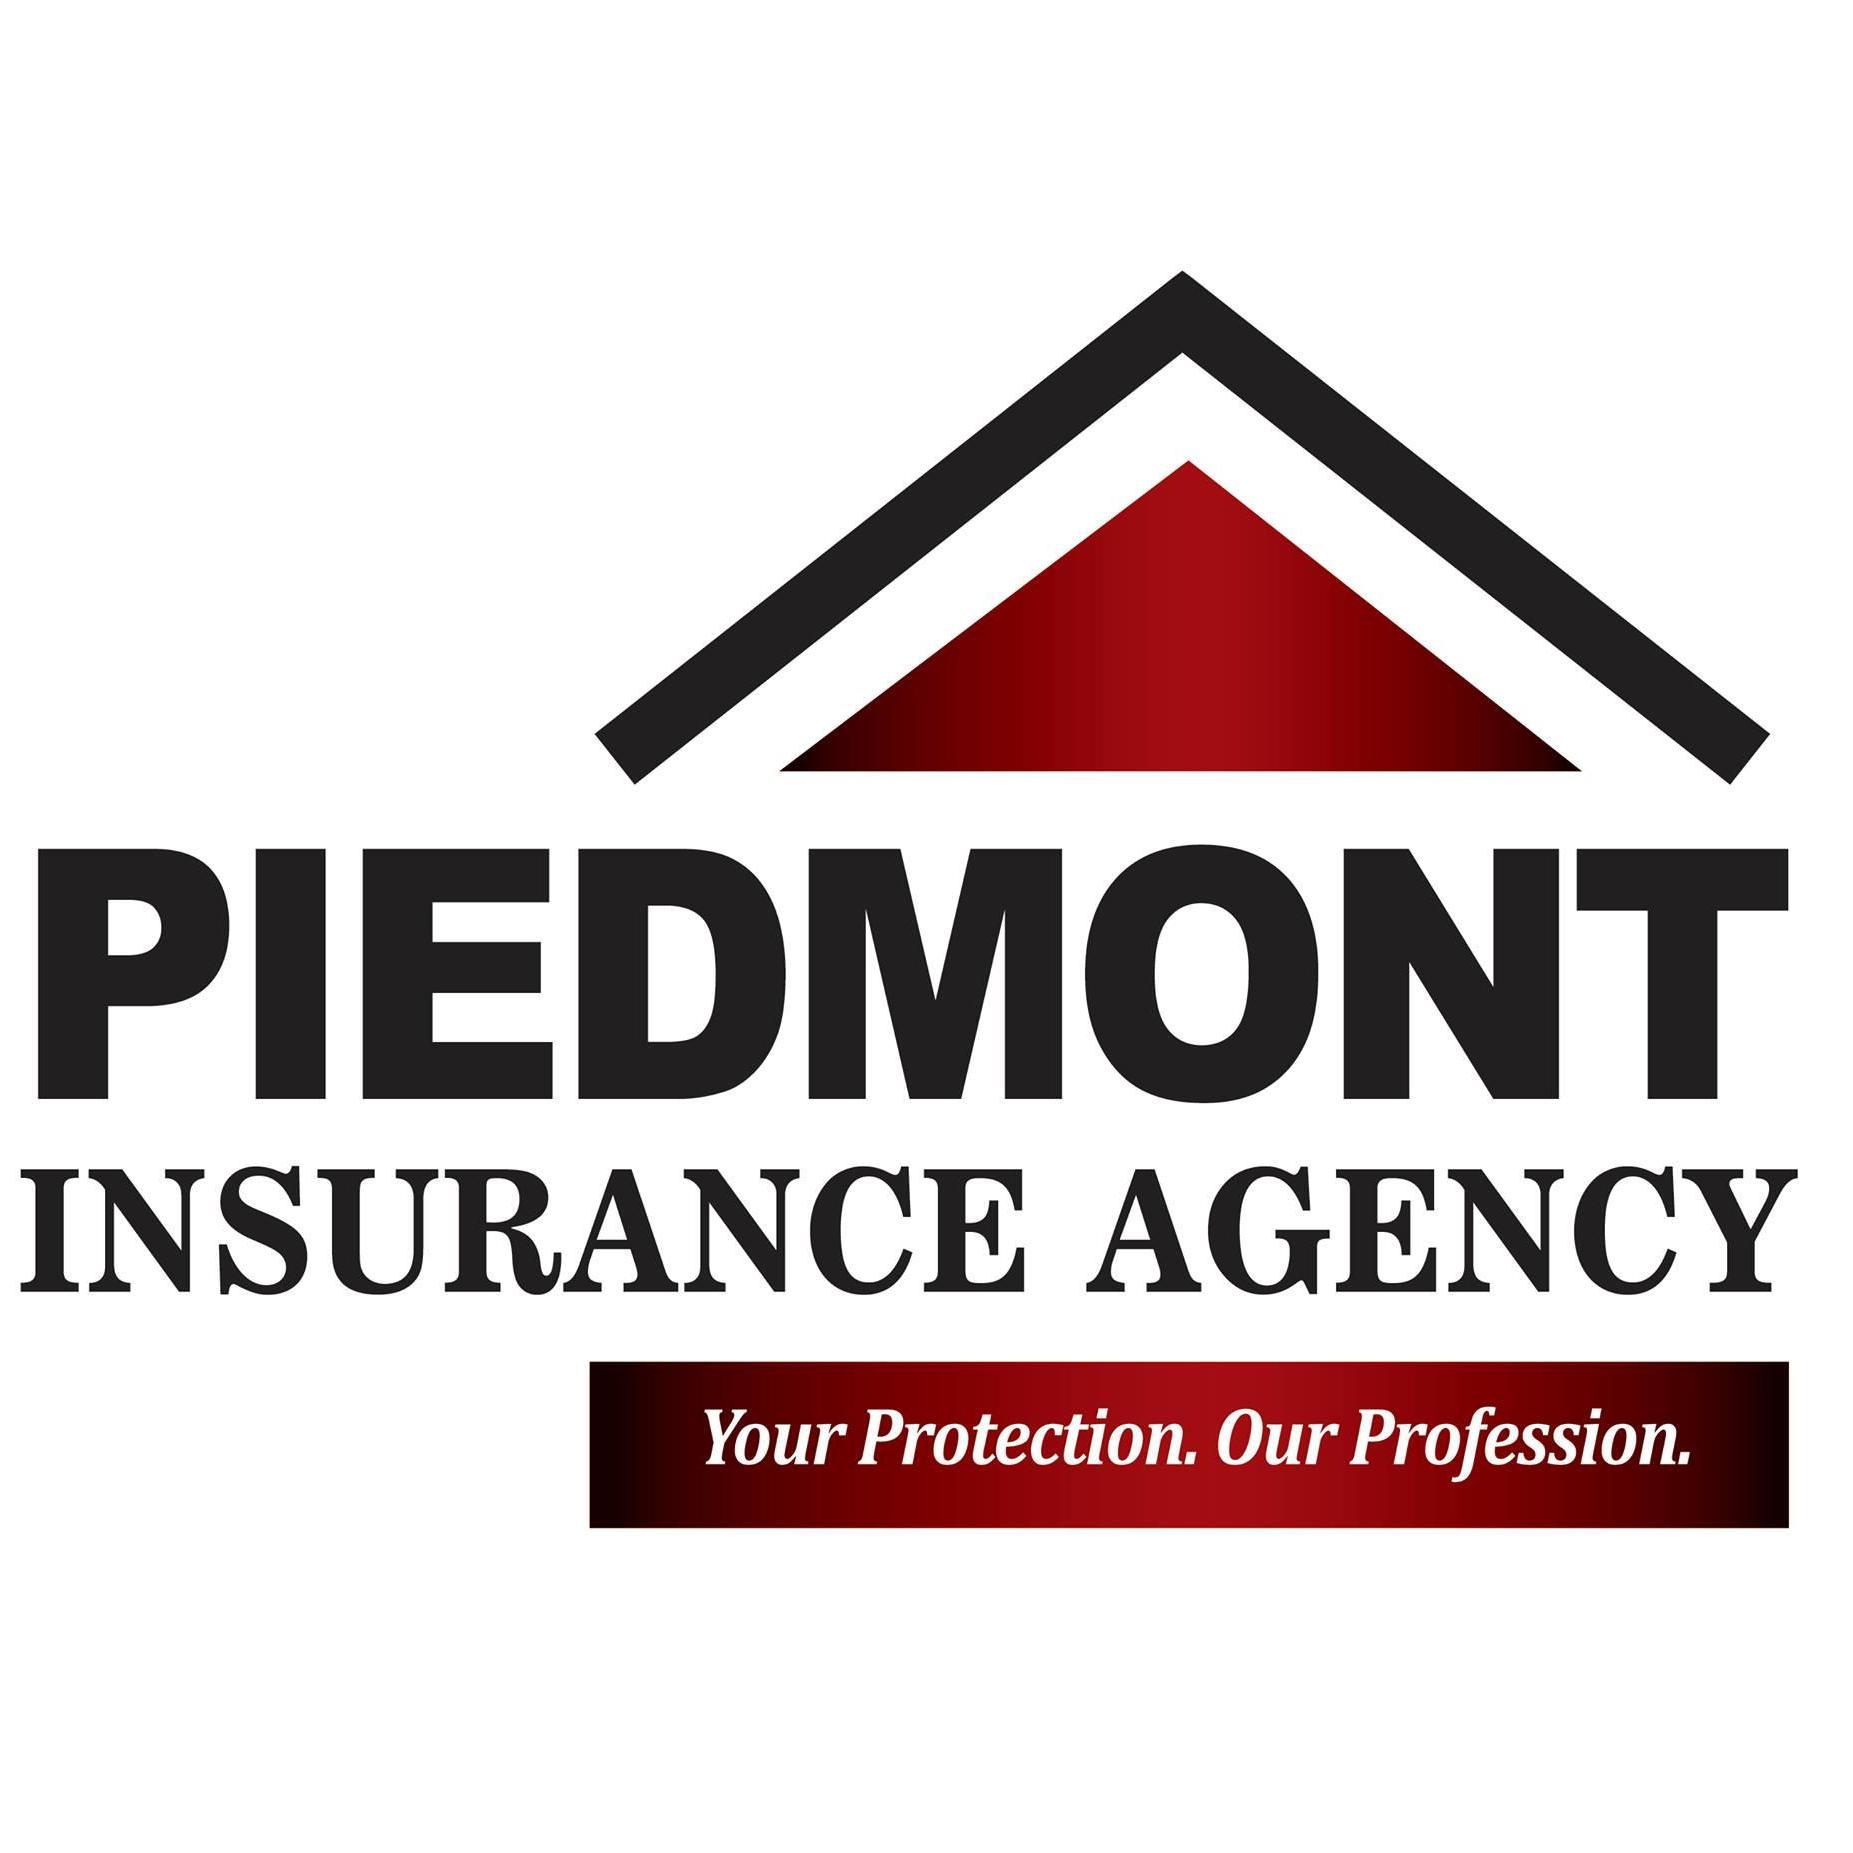 Piedmont insurance agency in winston salem nc 27127 for Bureau insurance